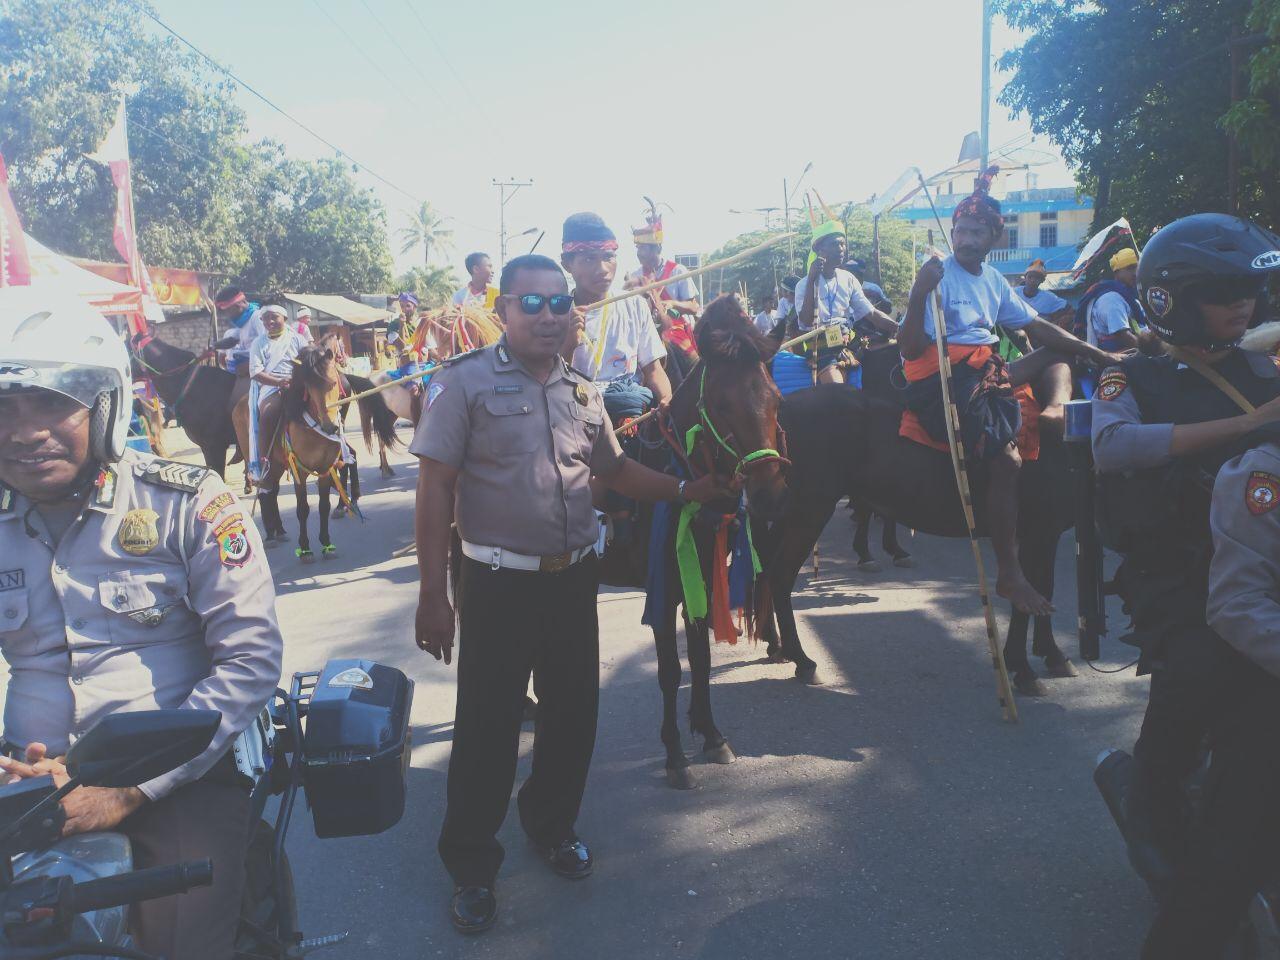 Event Pergelaran Parade 1001 Kuda dan Pameran 1001 Tenun Ikat Sumba